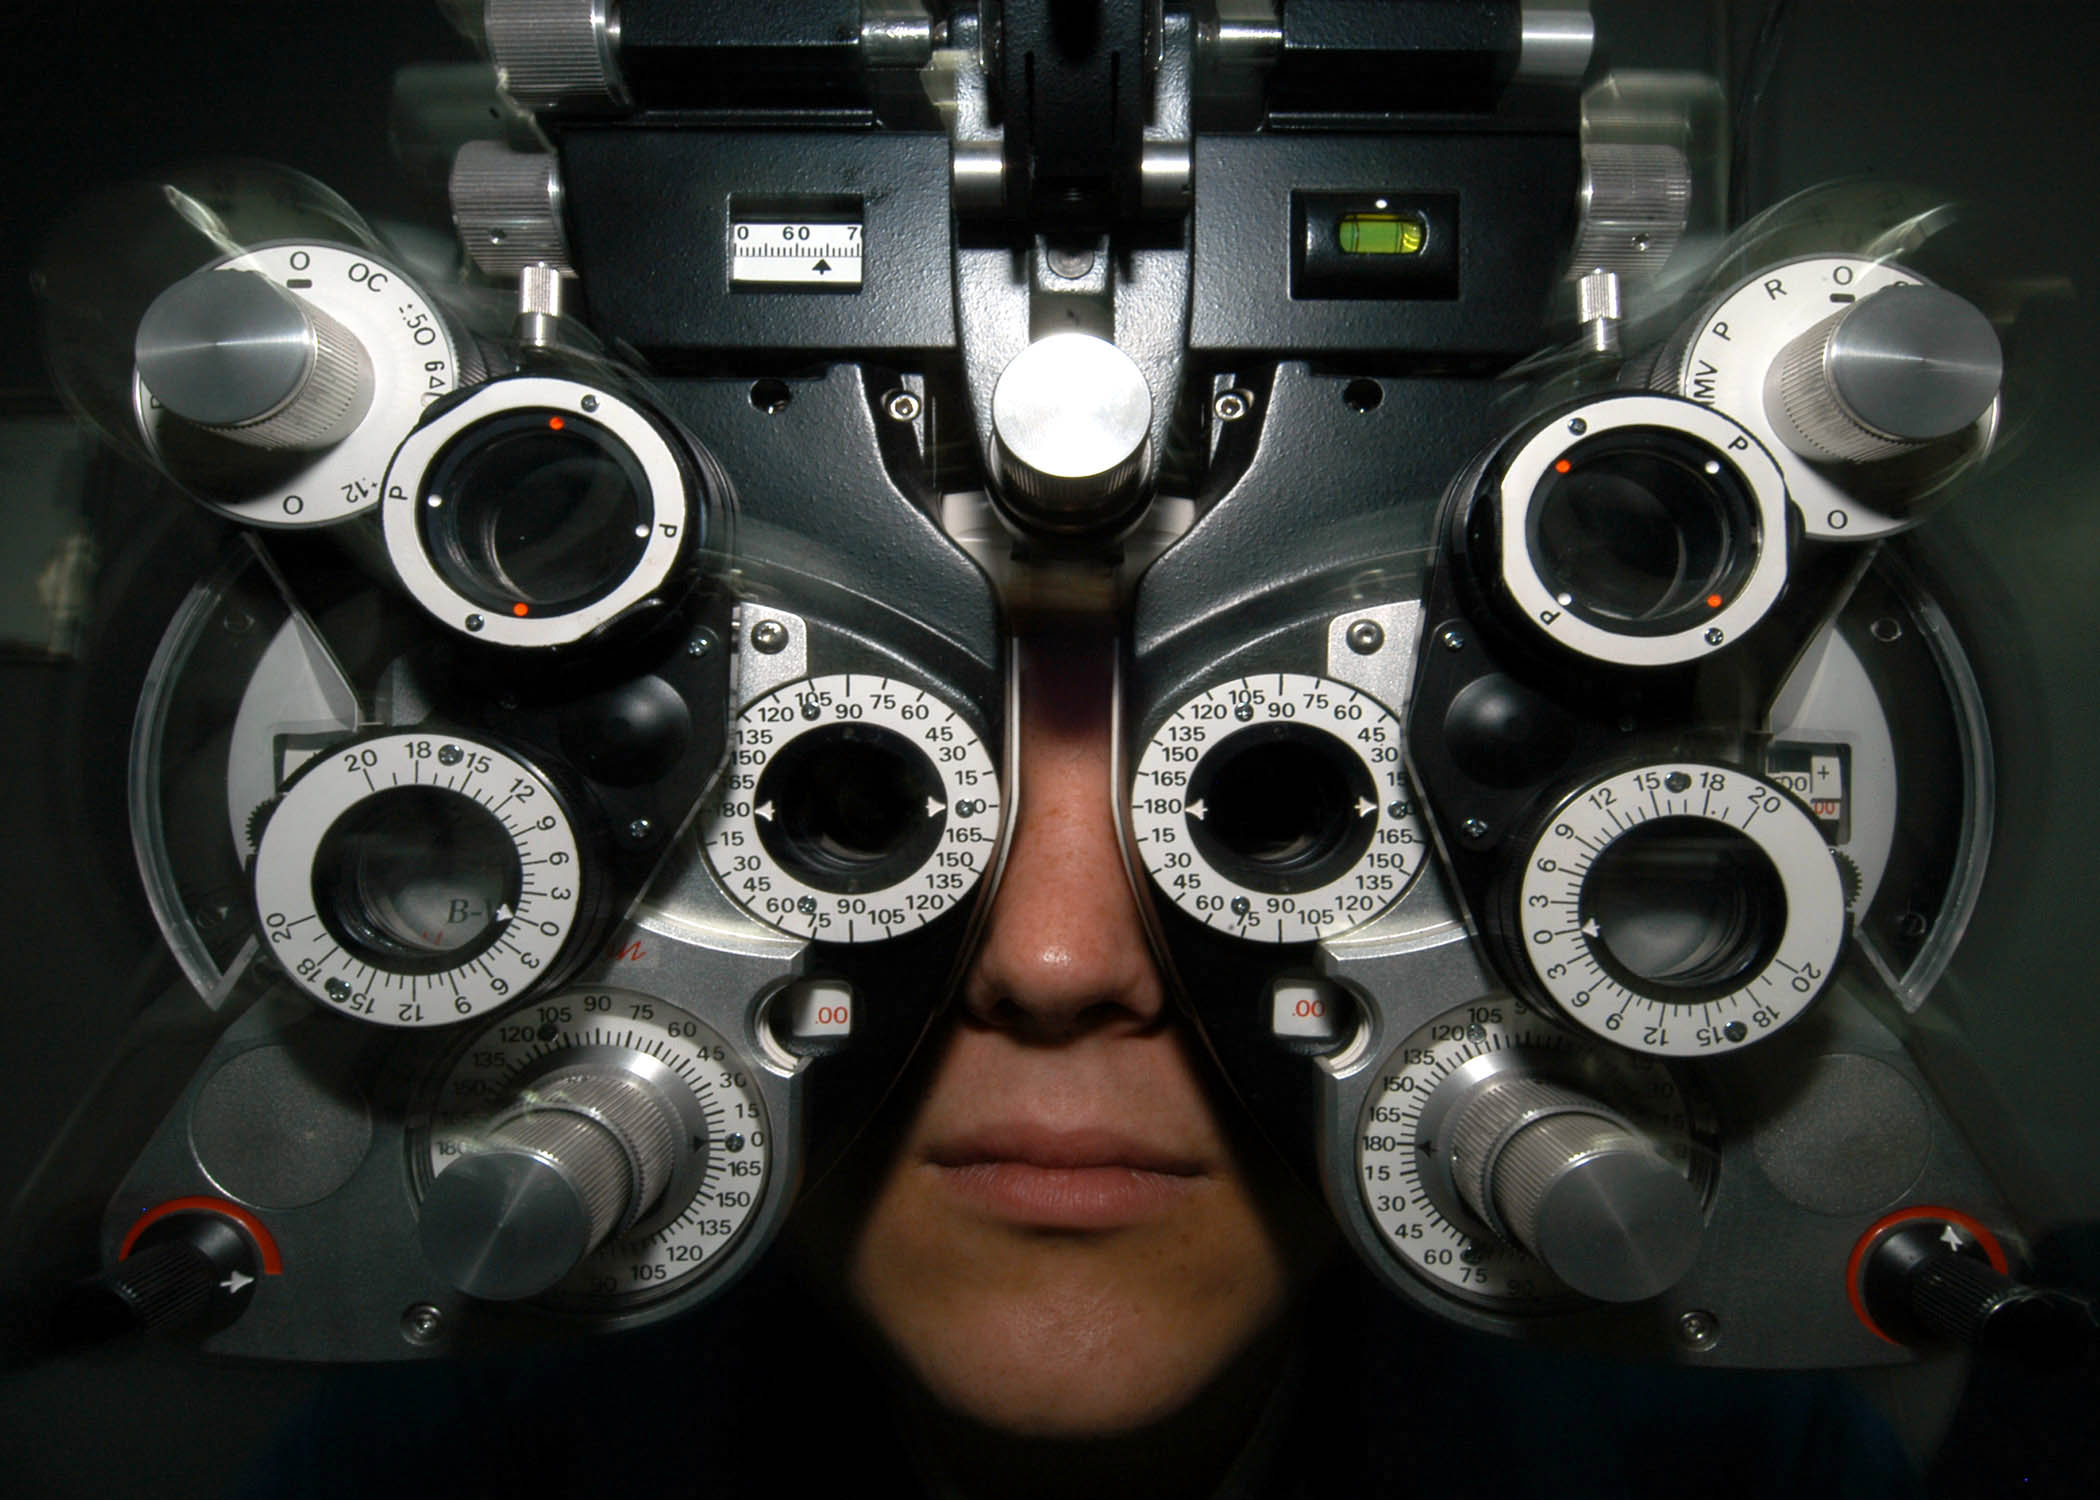 Geraet_beim_Optiker